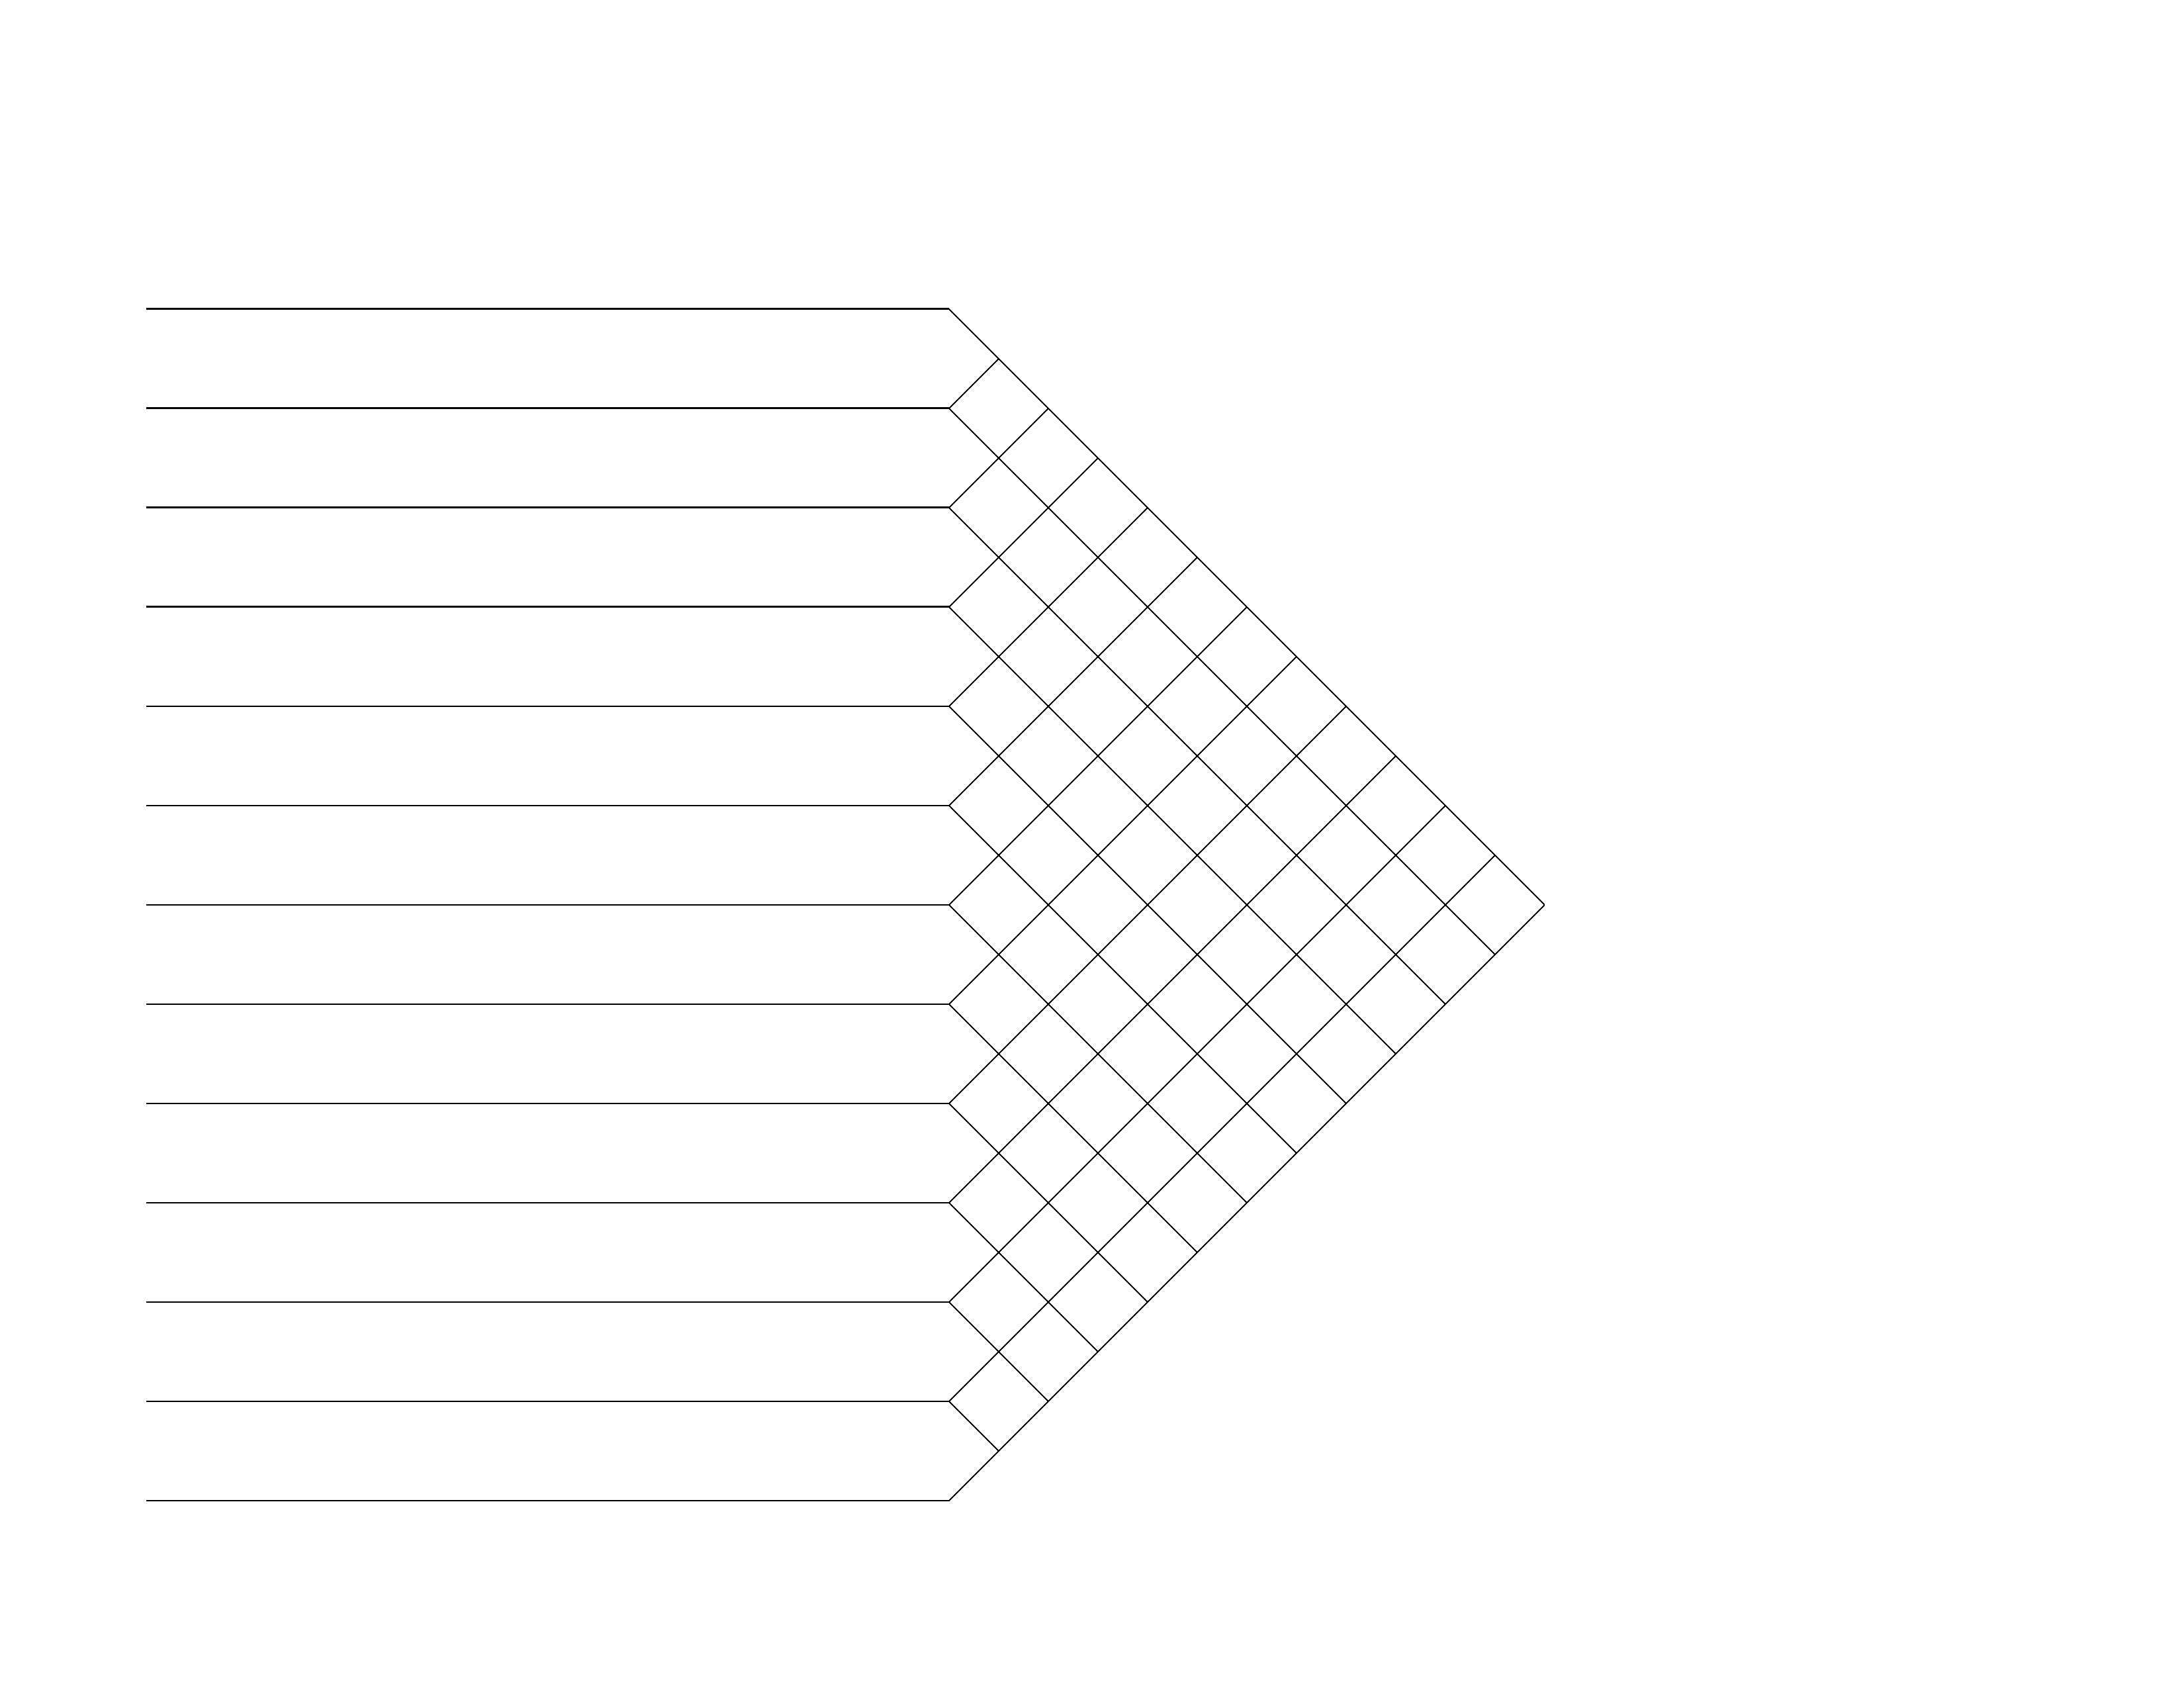 architecture bubble diagram template excel wiring of a car starter adjacency matrix interior design indiepedia org